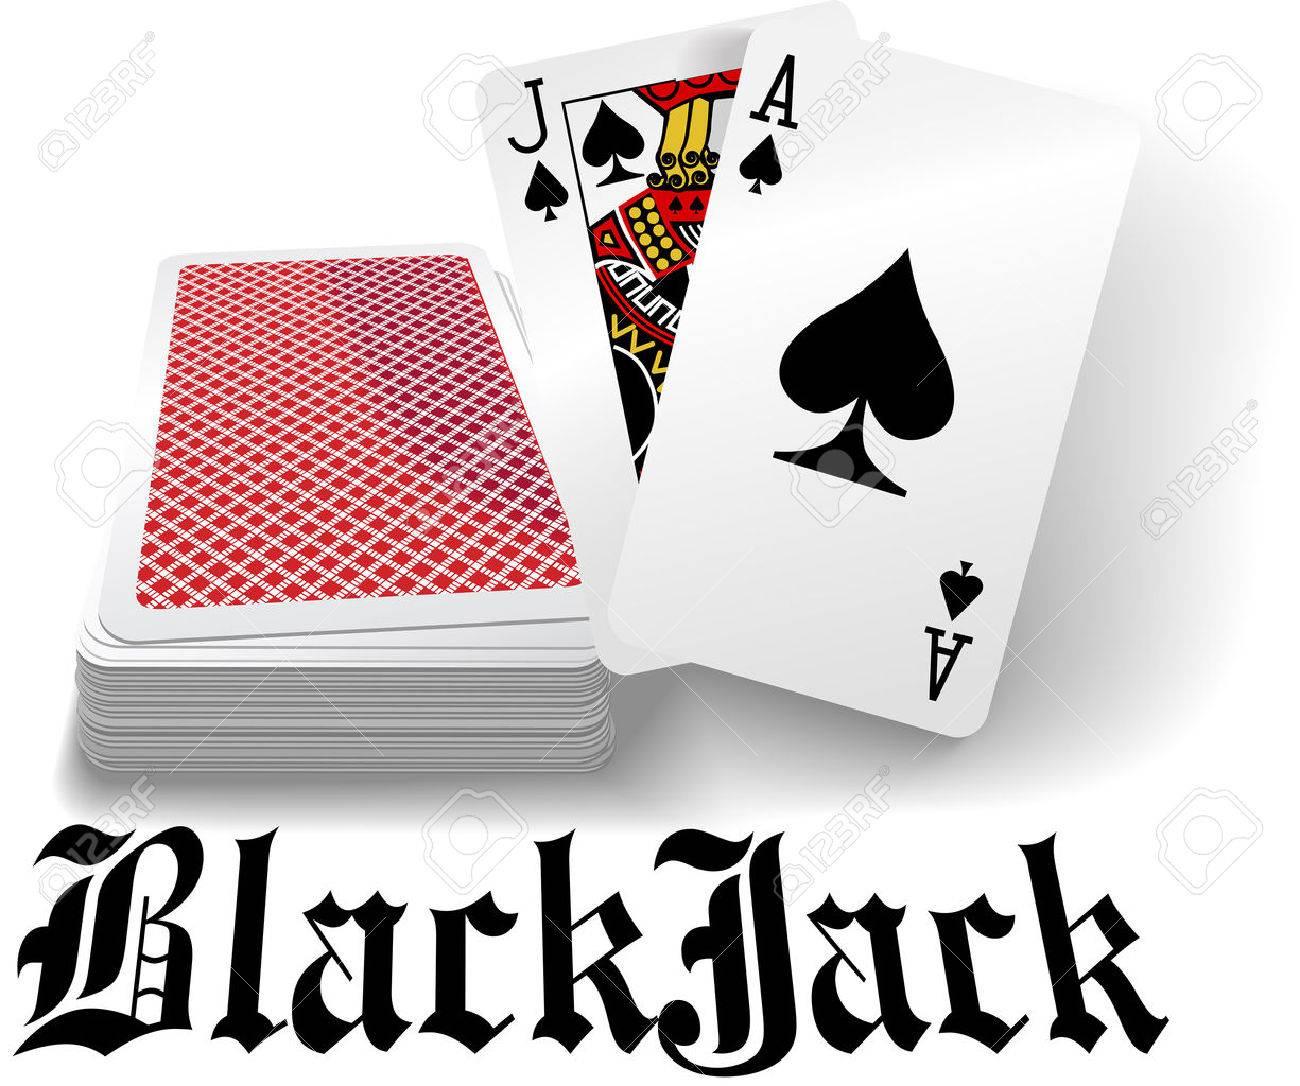 Black casino gambling jack kindercare casino rd